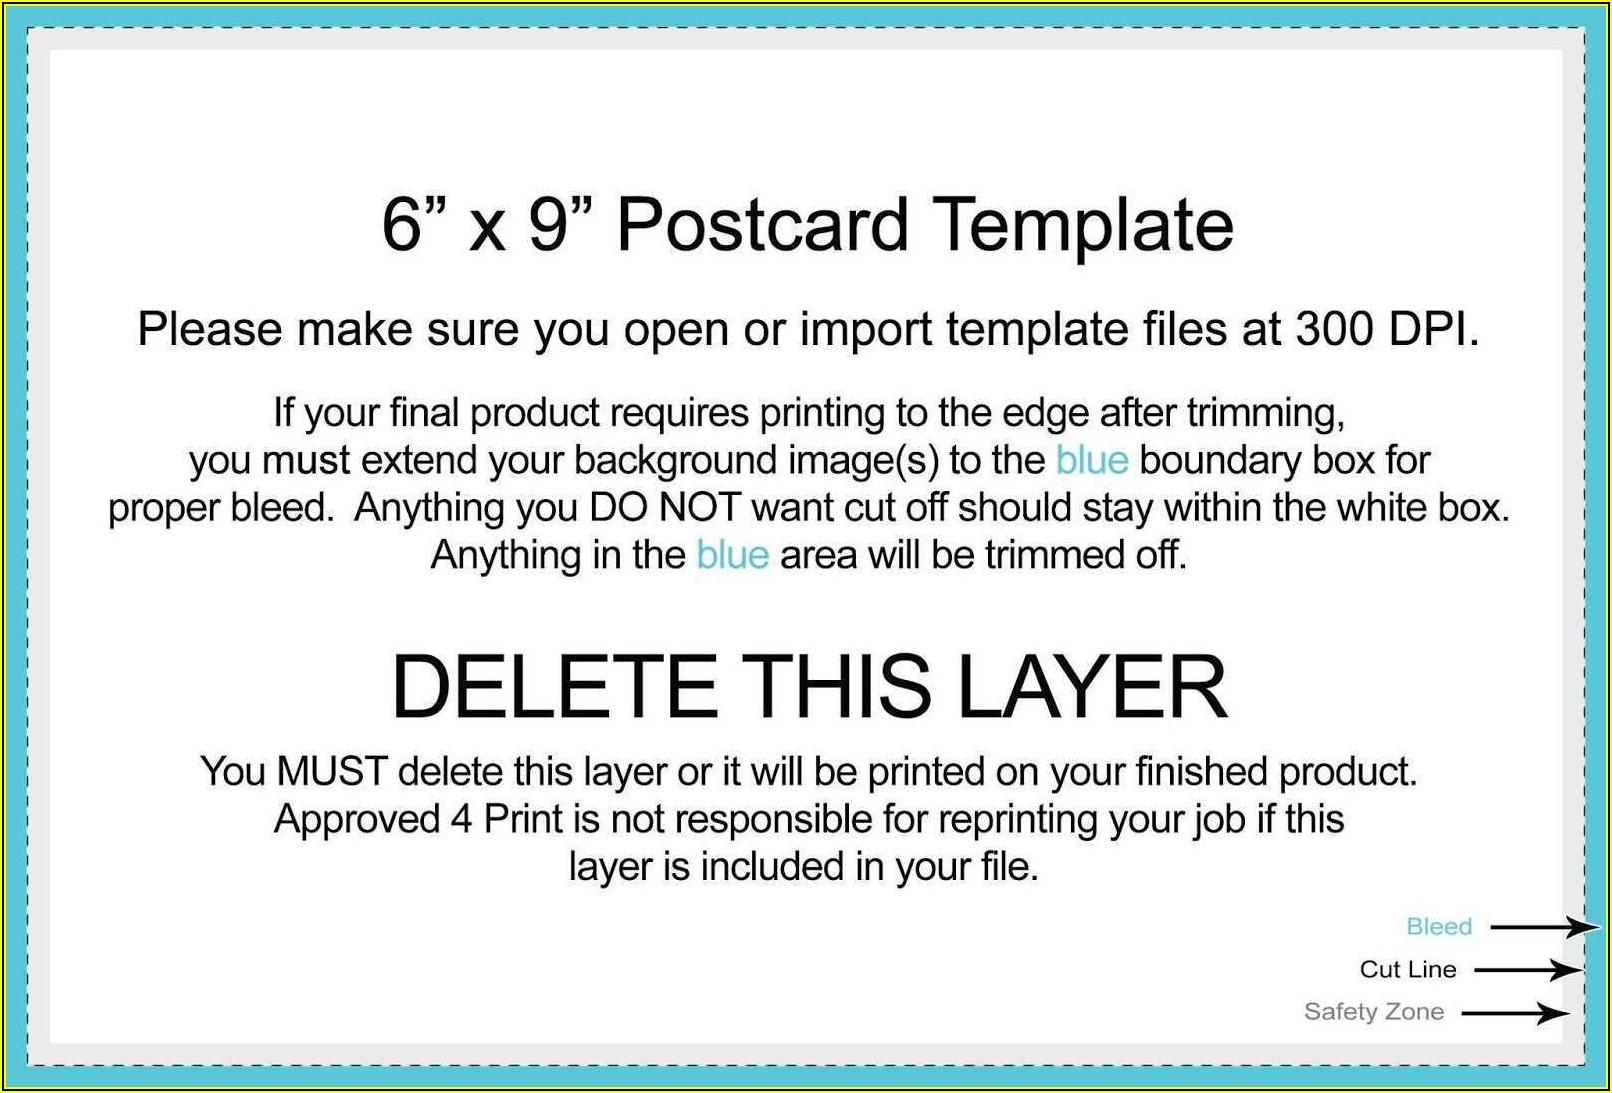 9x6 Postcard Template Usps